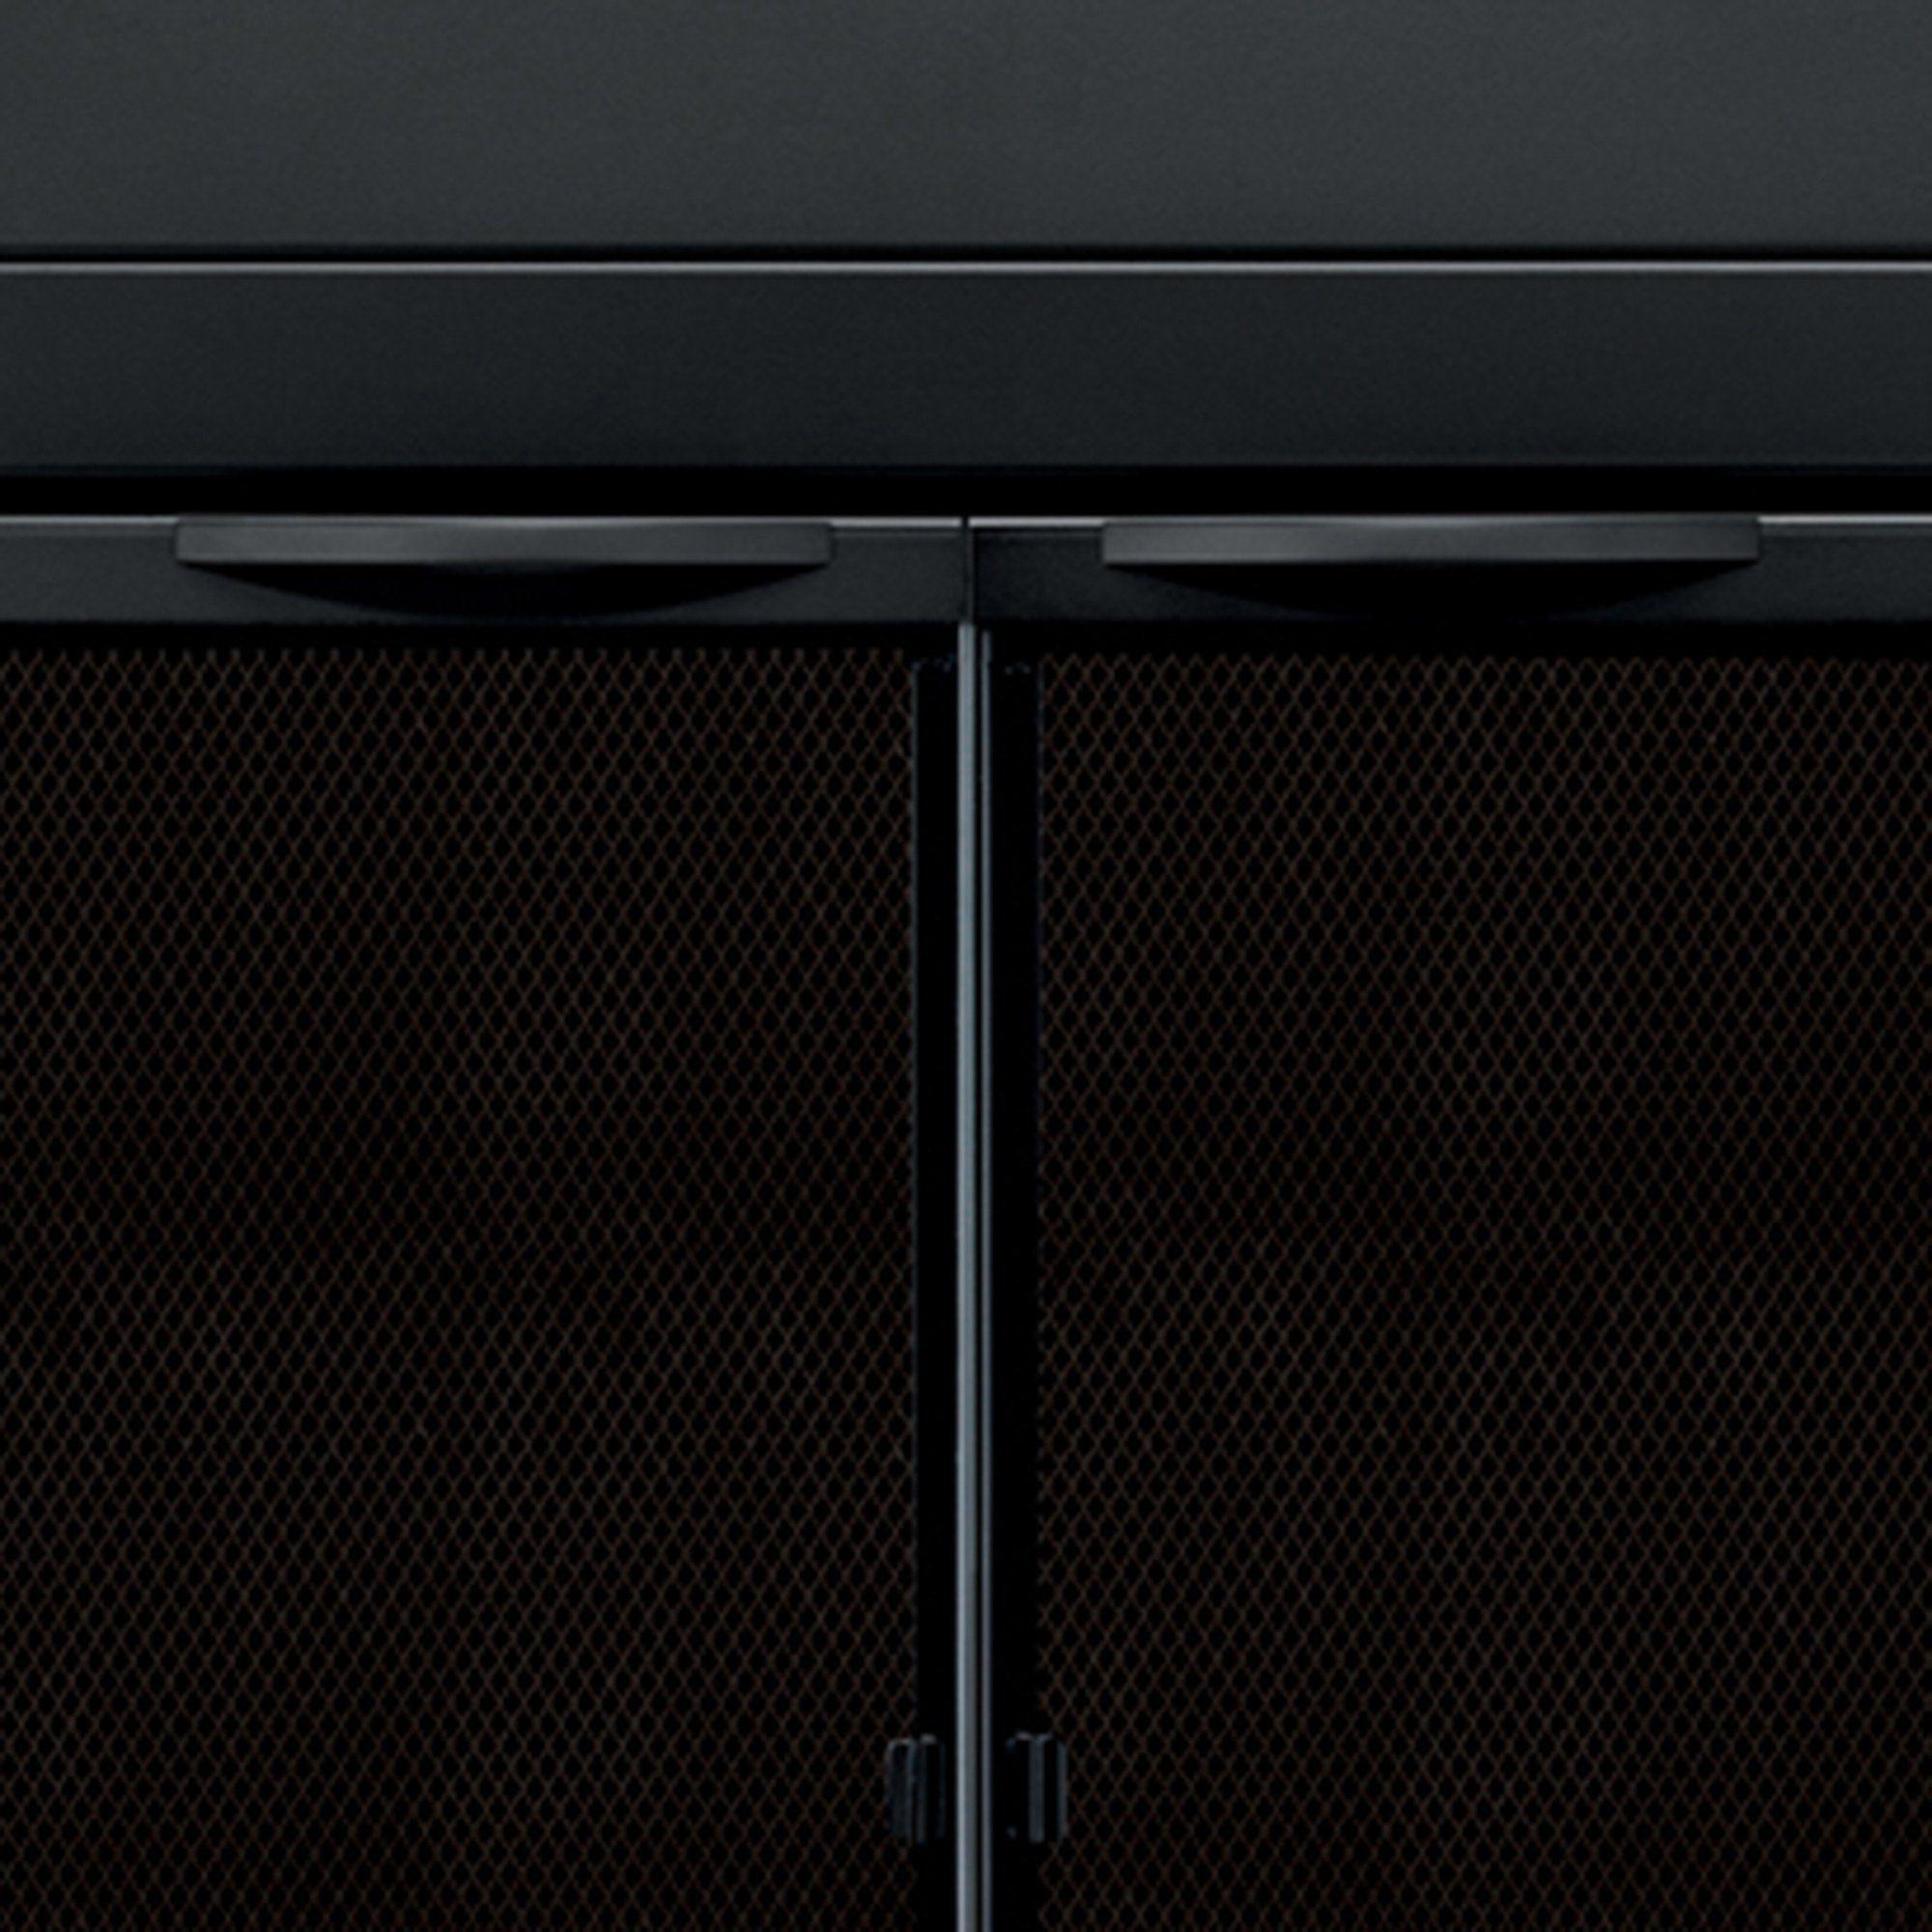 Pleasant Hearth An1012 Alpine Fireplace Glass Door Black Large **